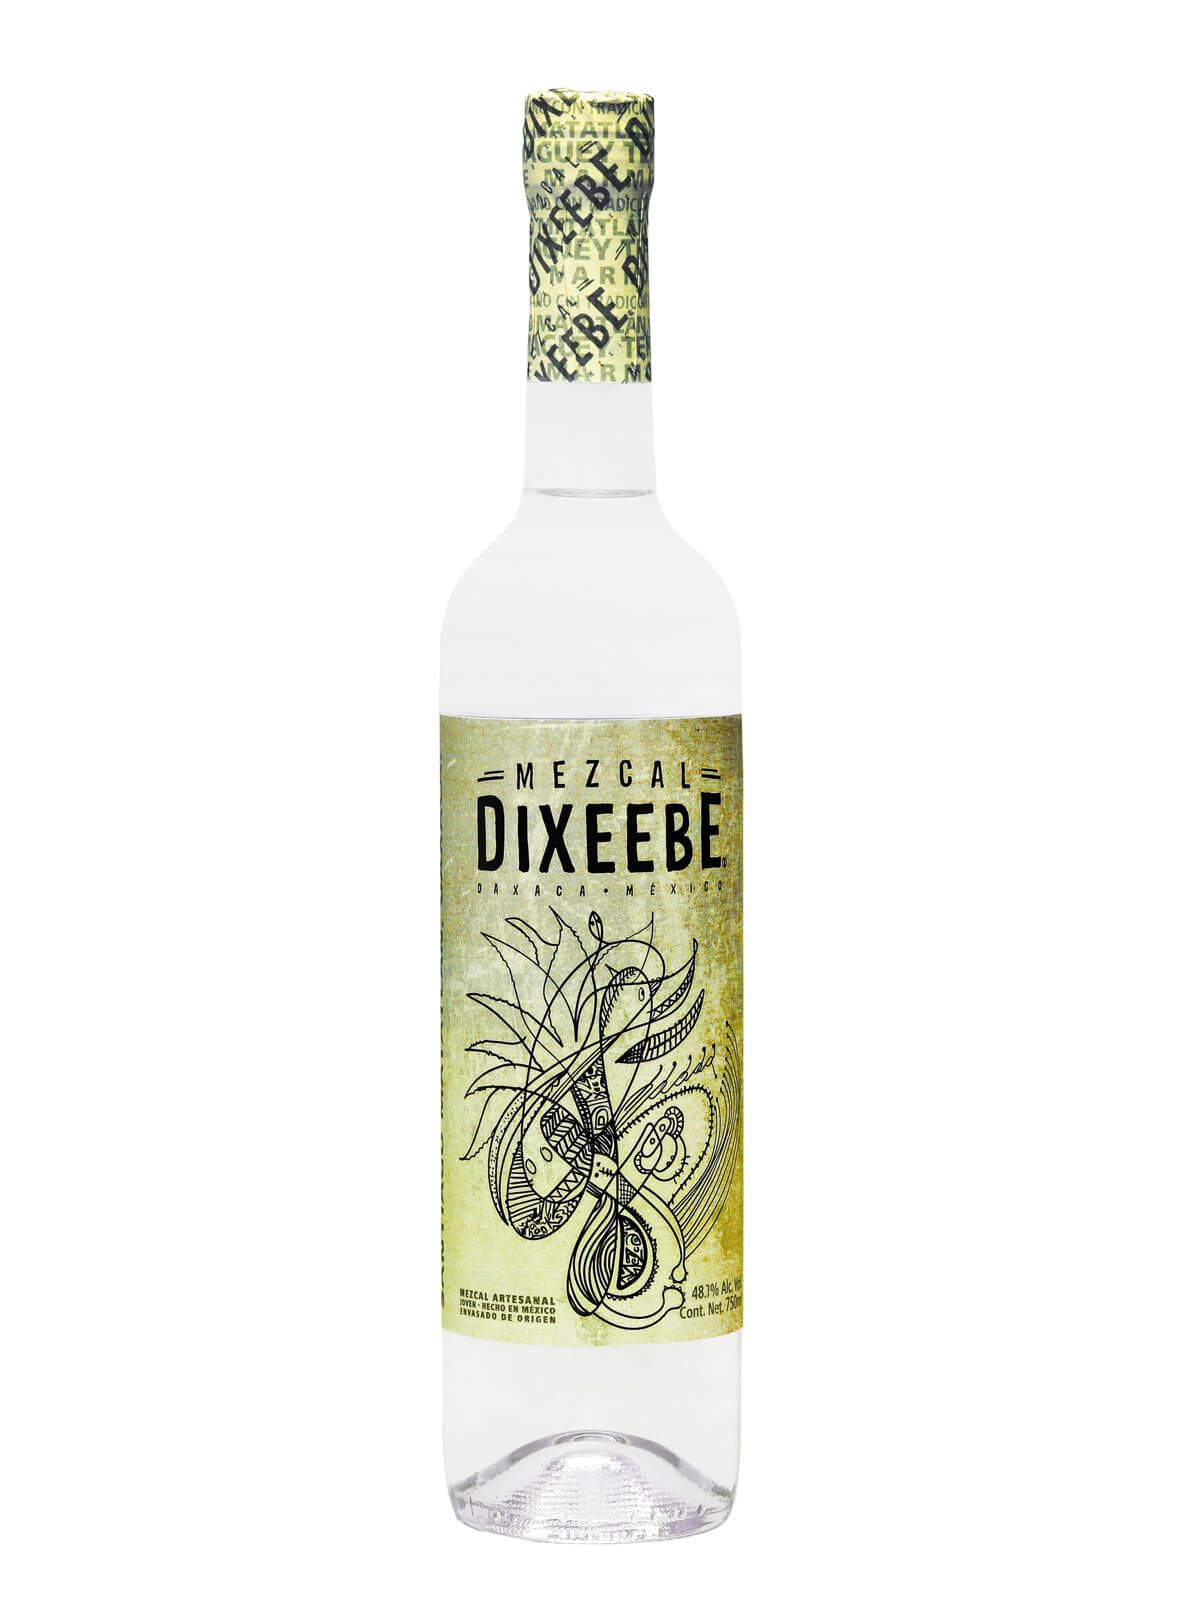 Mezcal Dixeebe Coyote bottle